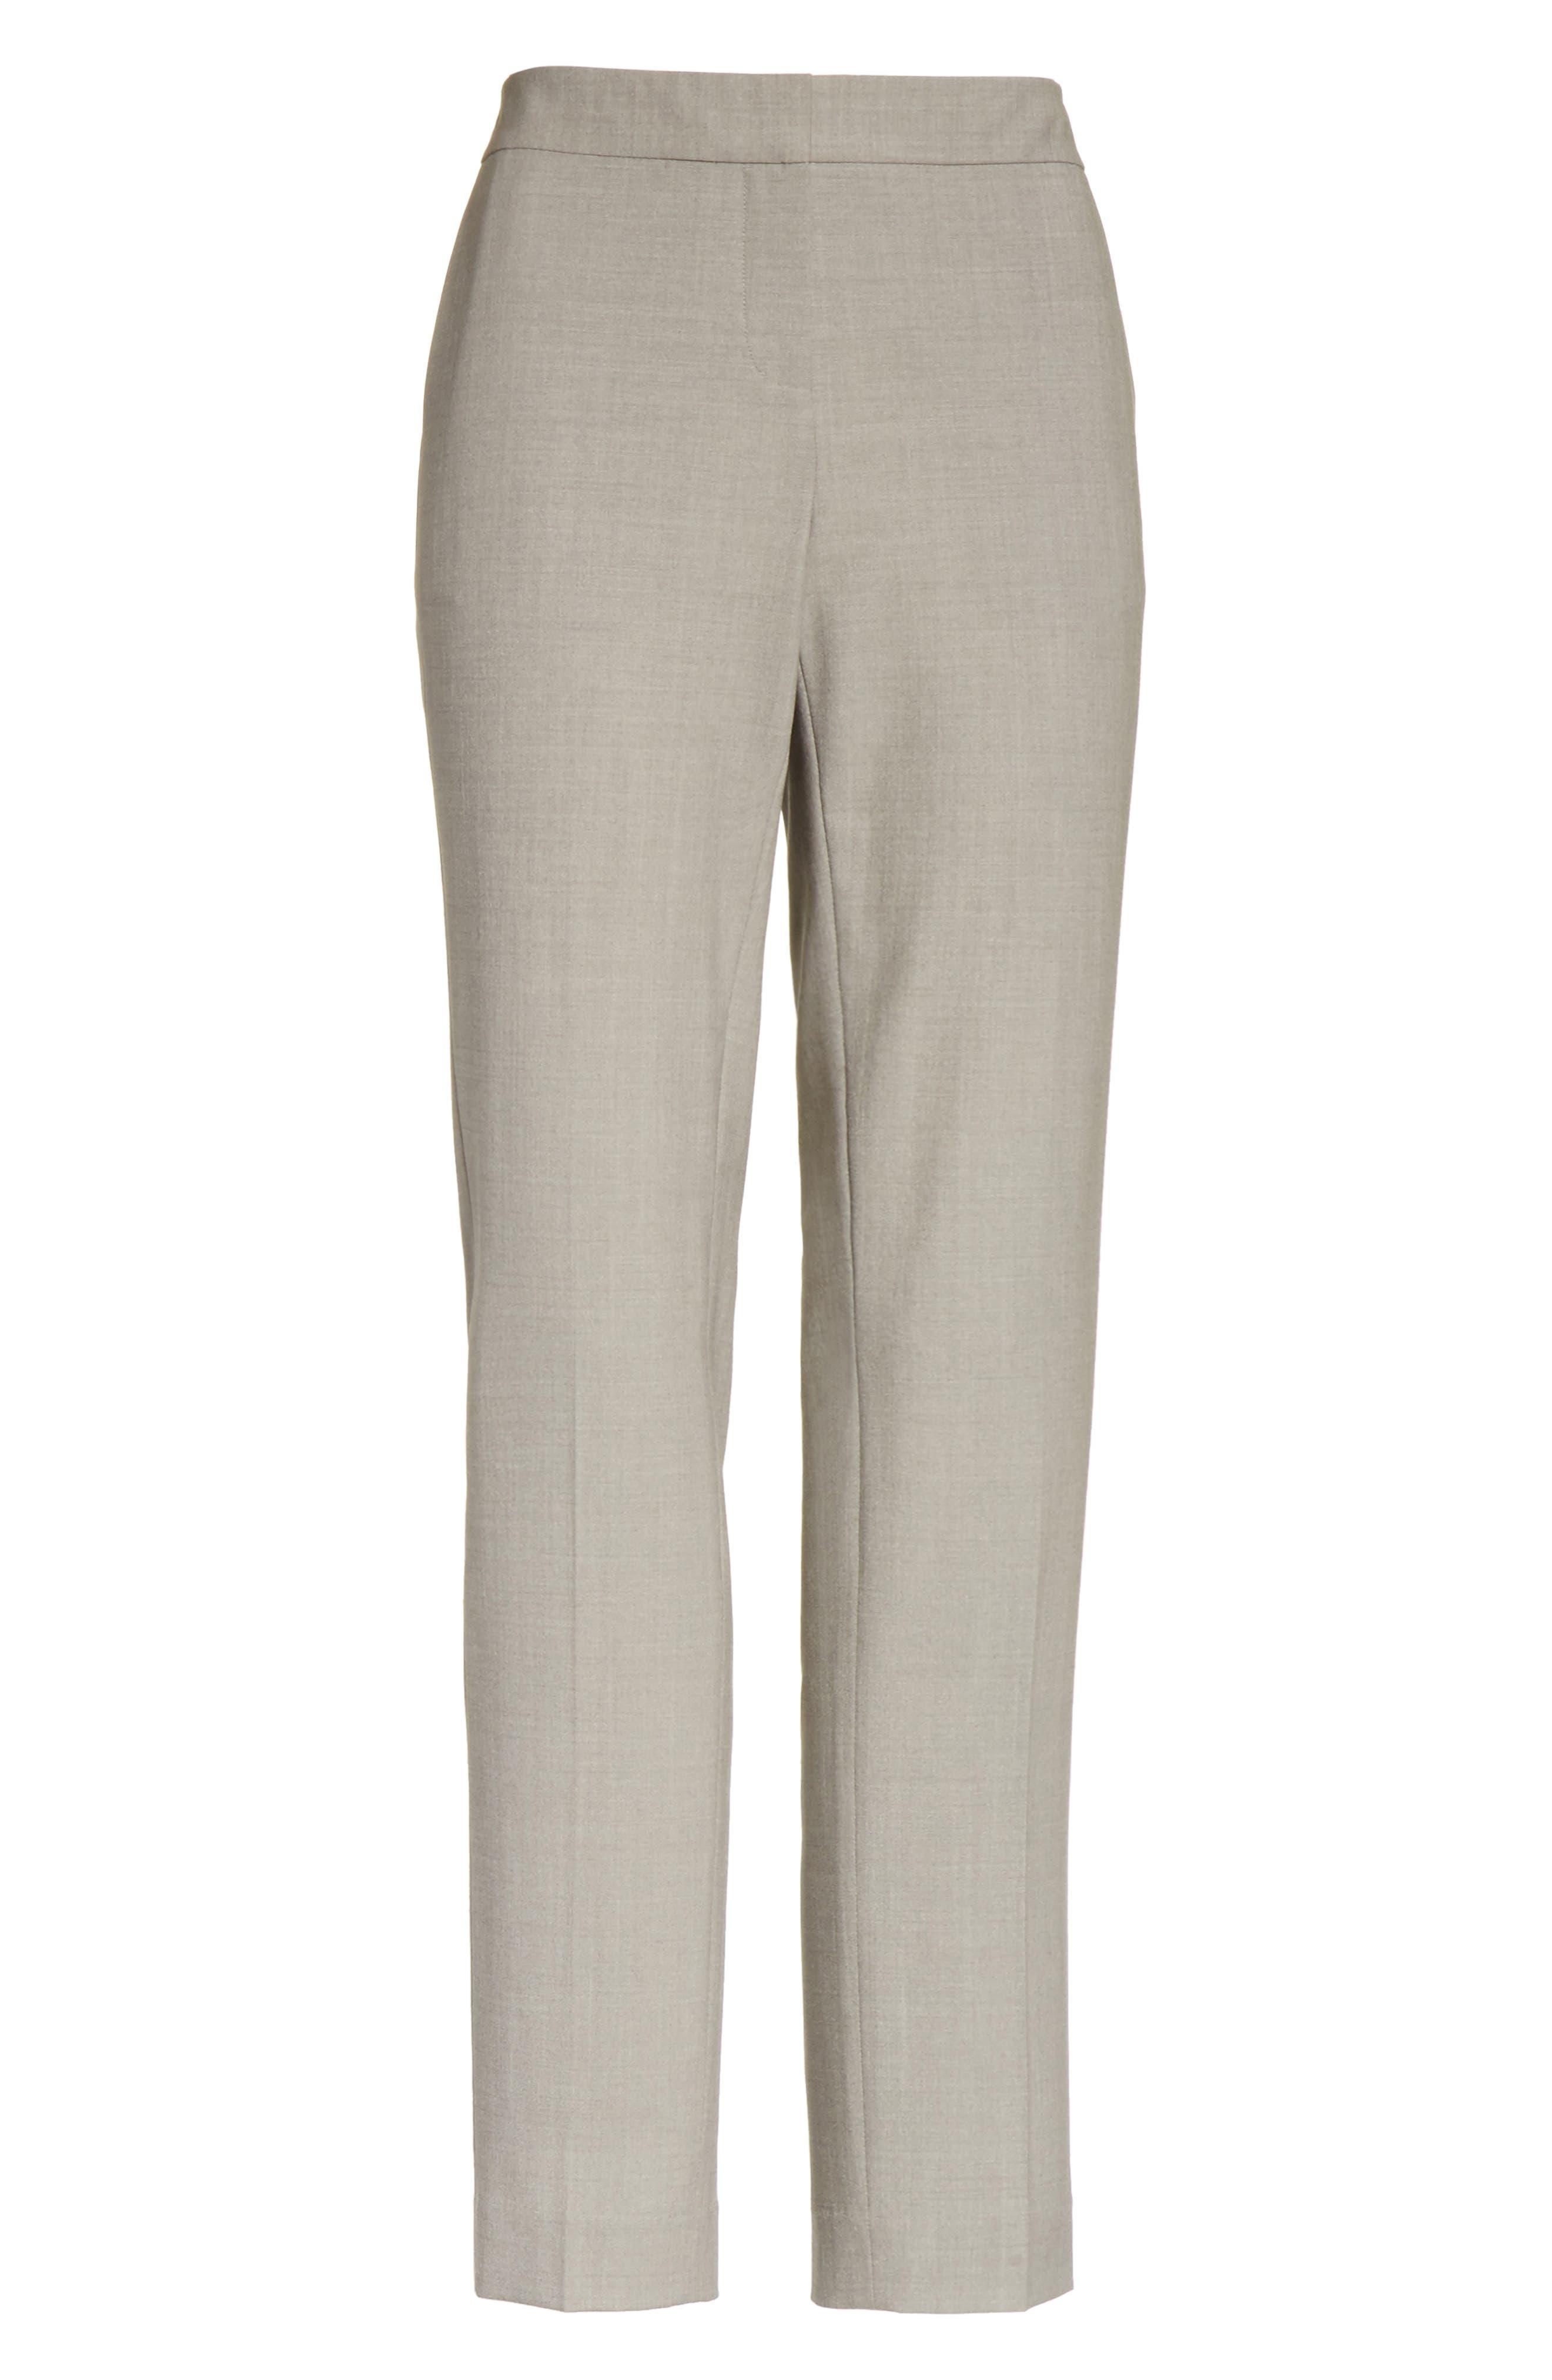 Manhattan Slim Pants,                             Alternate thumbnail 7, color,                             Feather Grey Melange